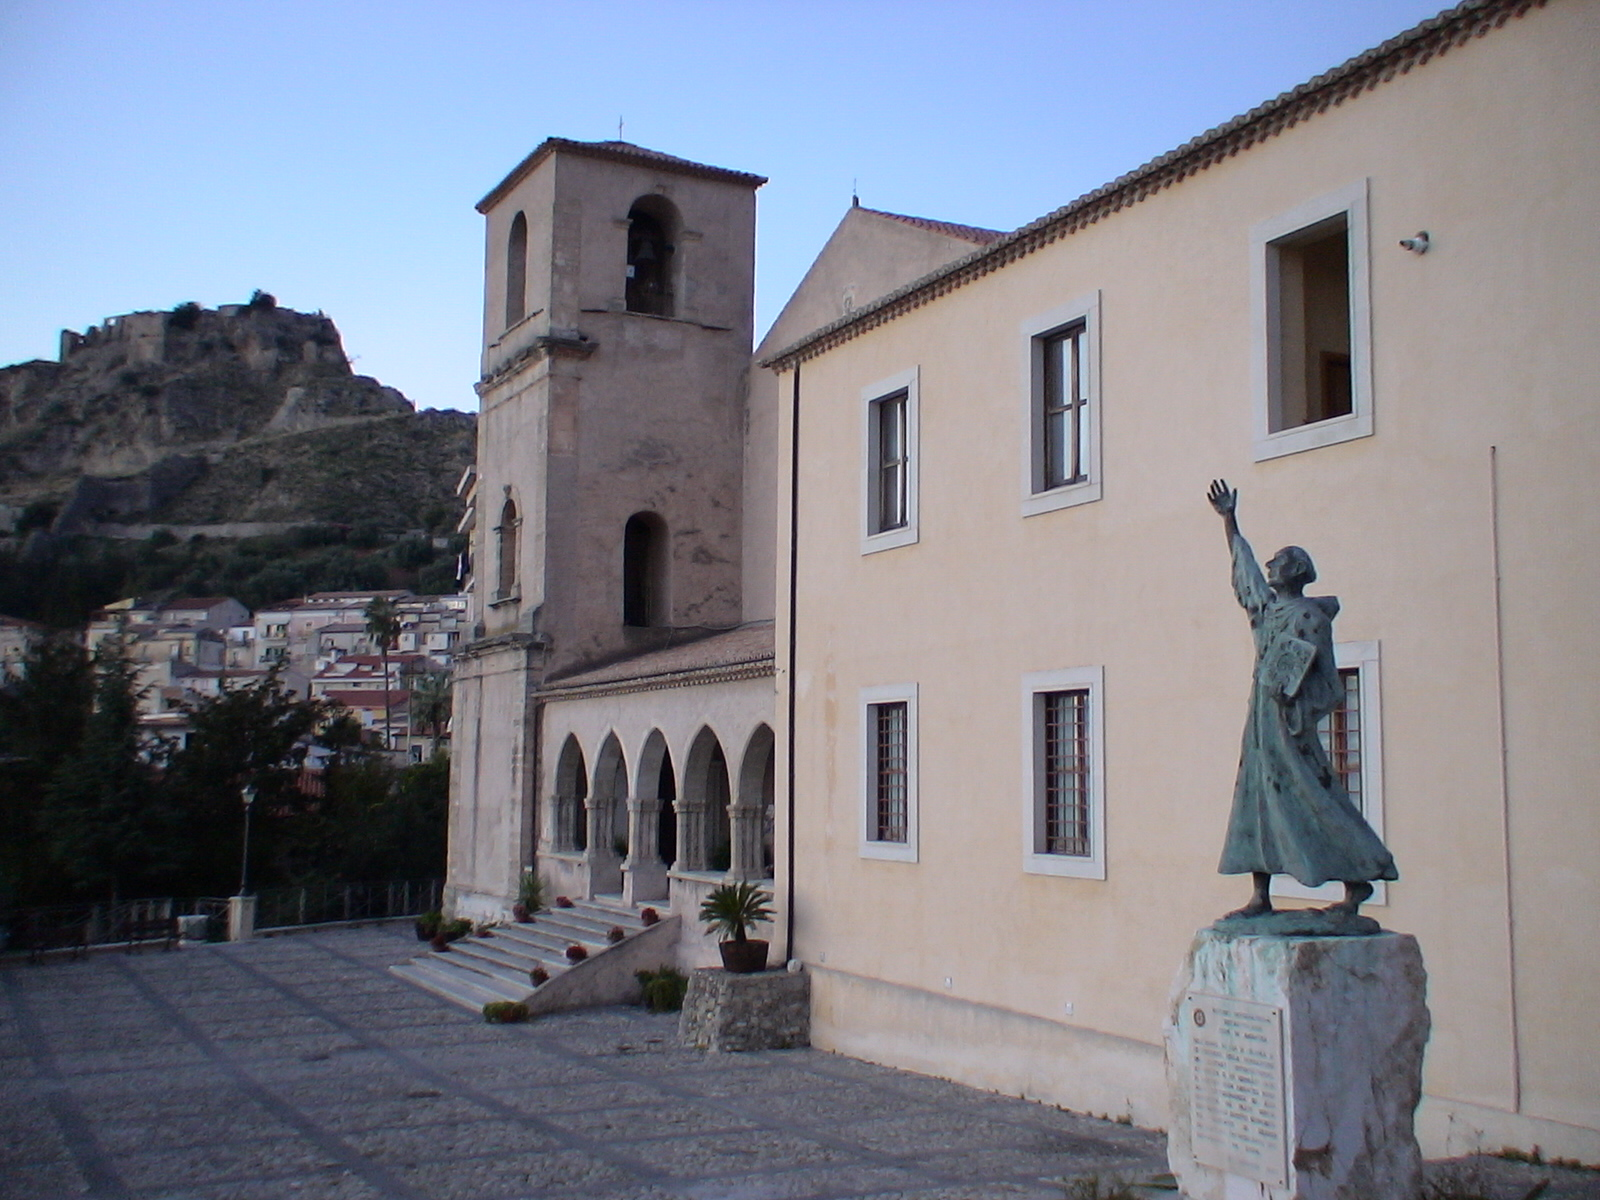 Convento frati minori francescani San Bernardino1_byAZ, amantea